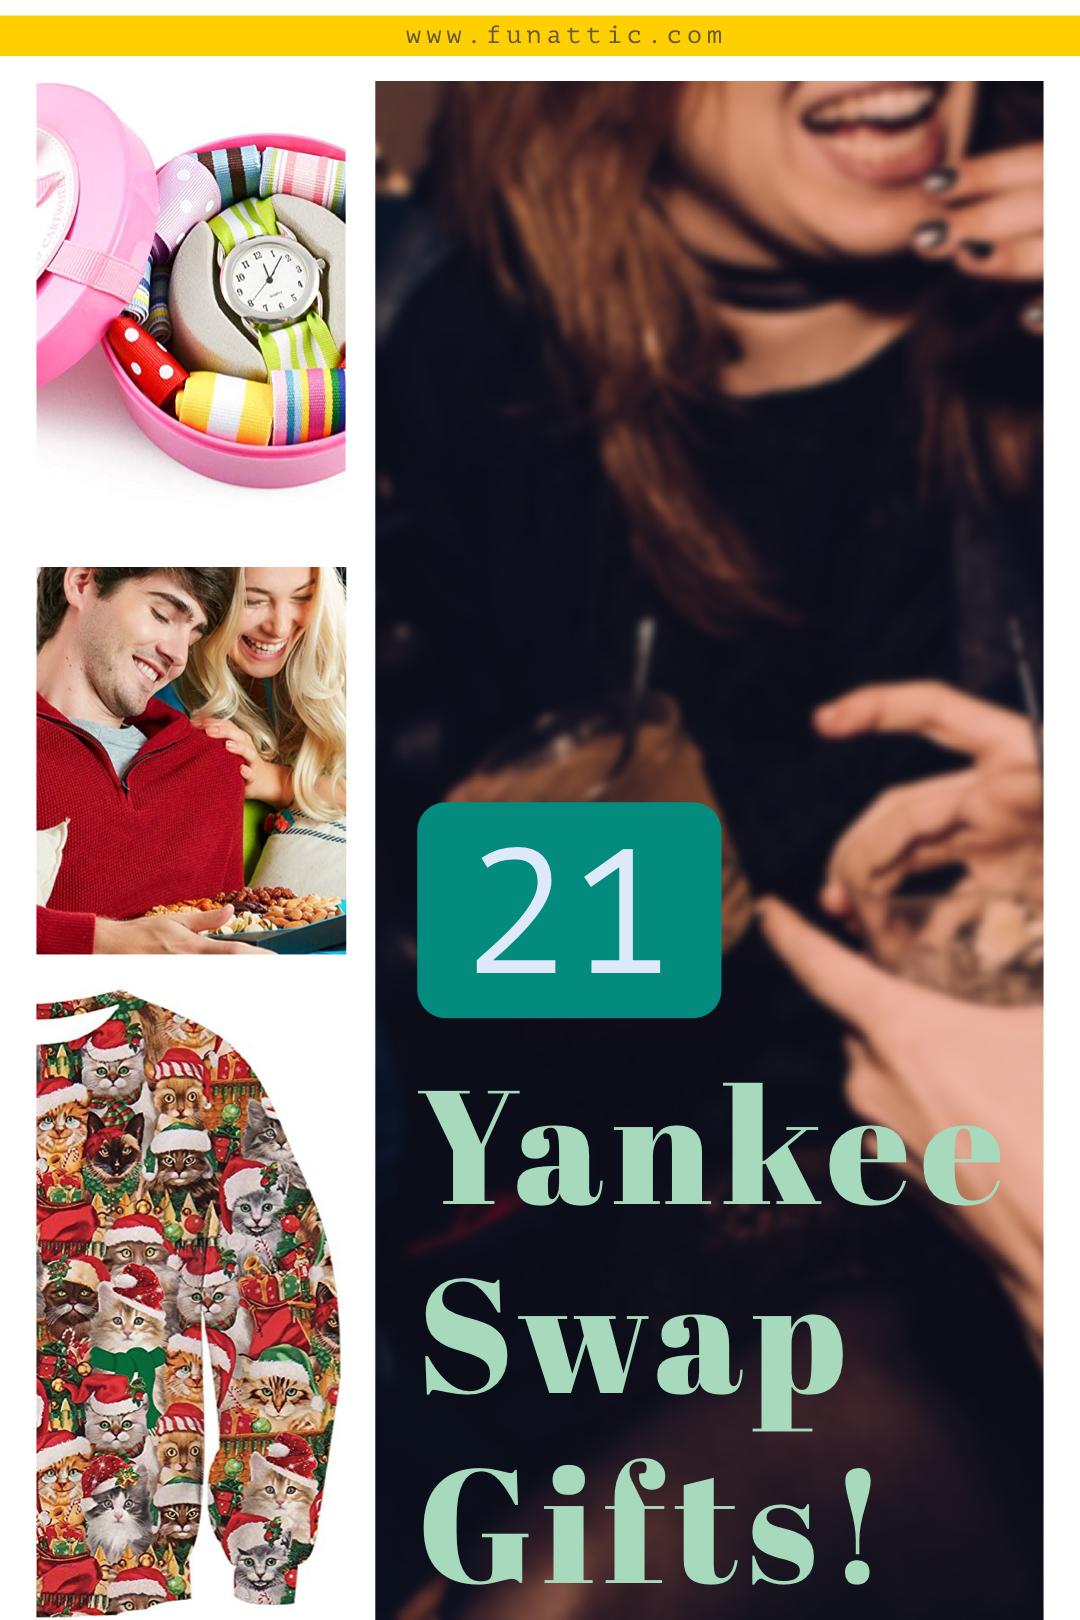 Best Yankee Swap Gifts | Best yankee swap gifts, Swap ...